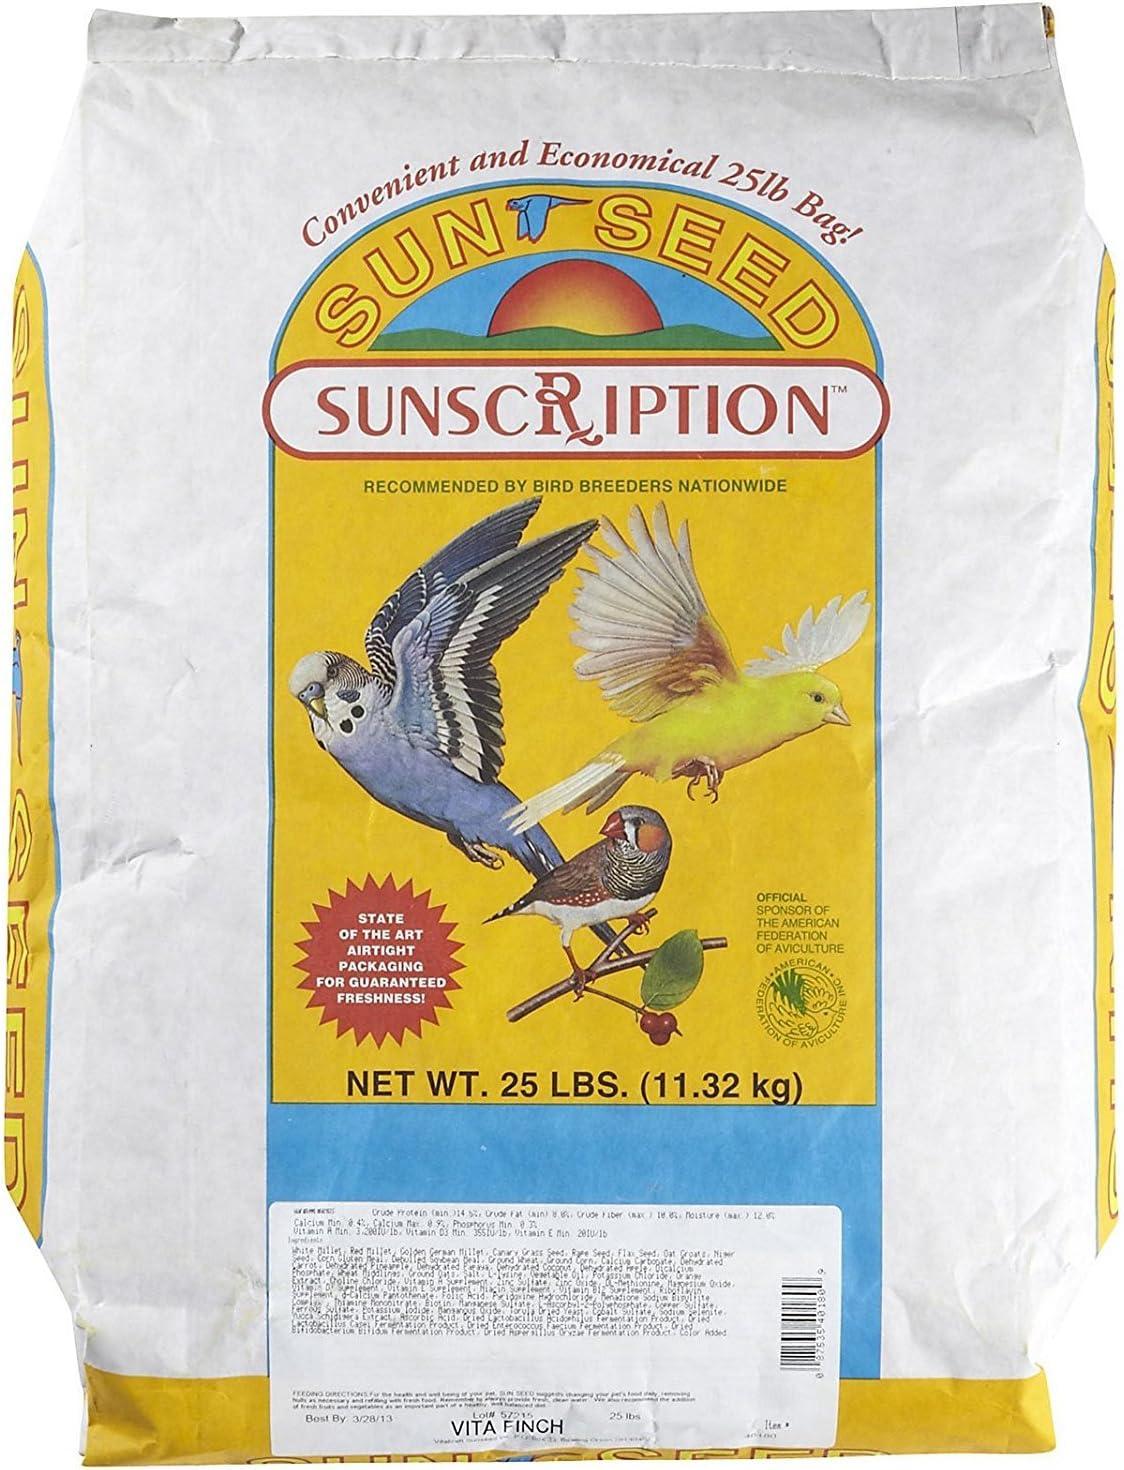 Sunthing Special Vita Finch Formula